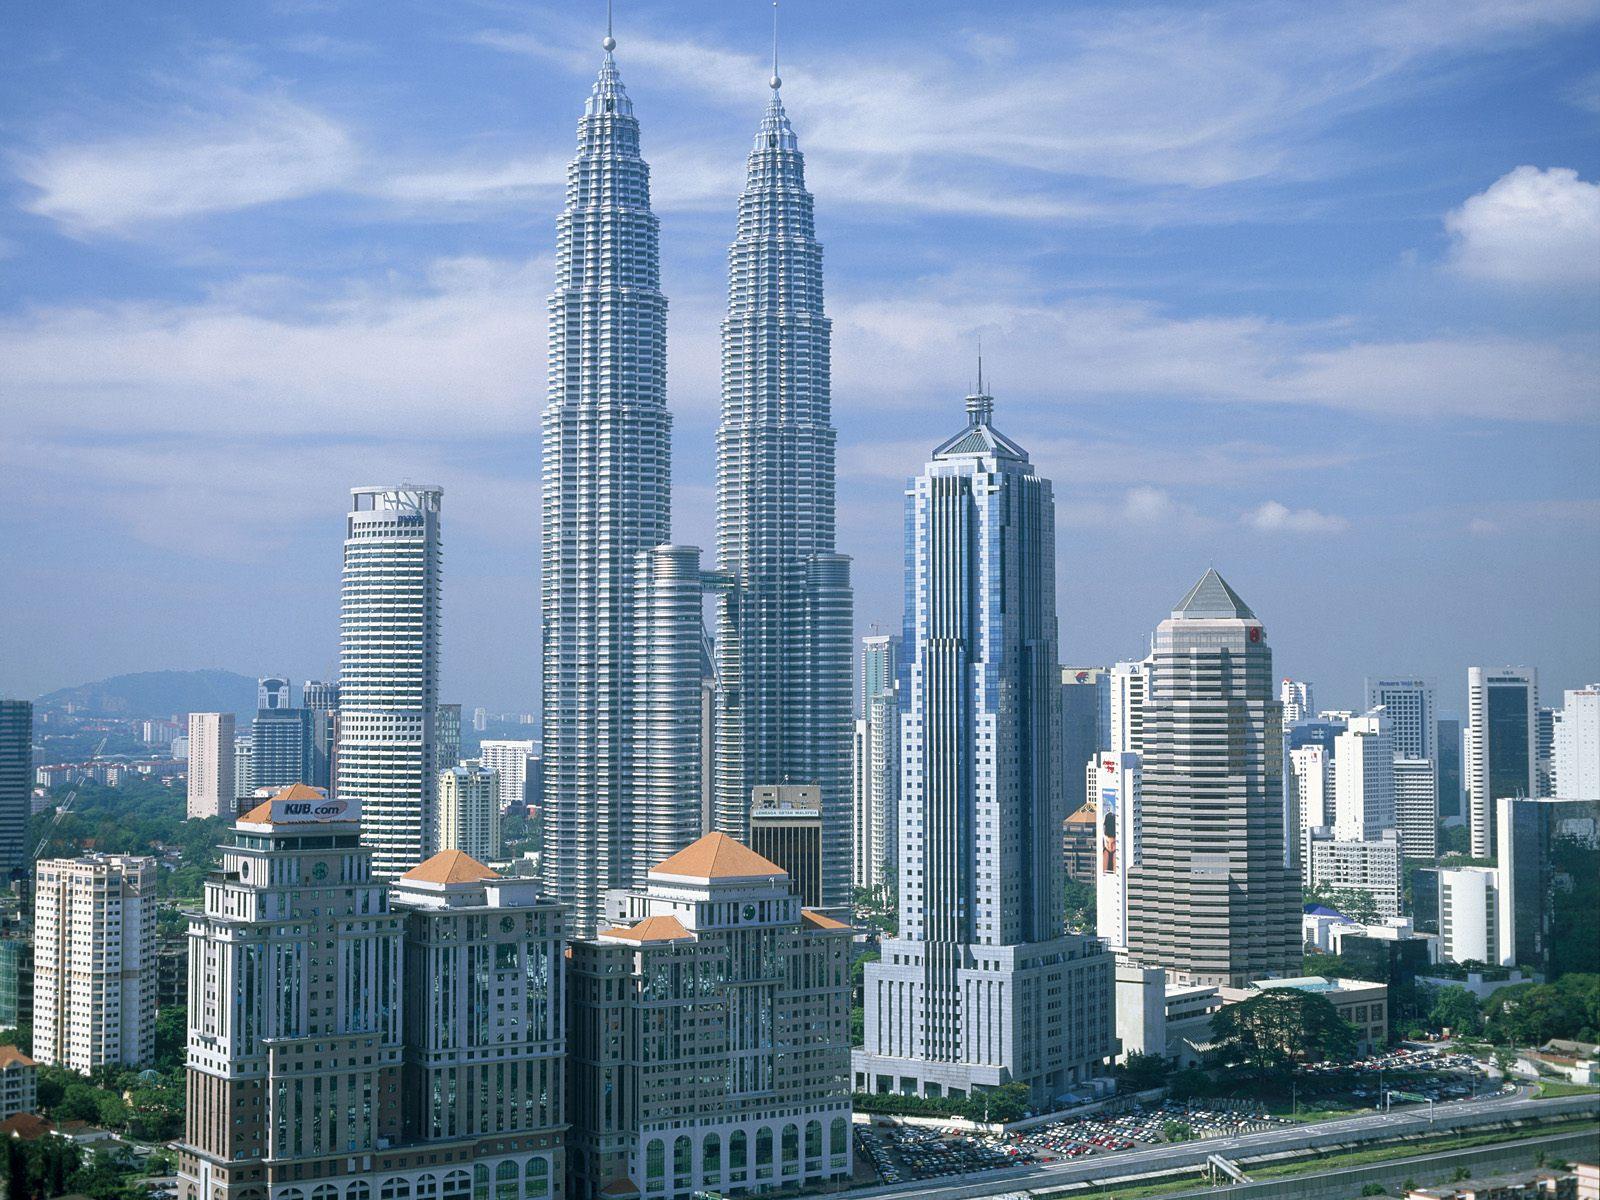 http://4.bp.blogspot.com/-yu8Z8h7A_Vs/TefK5LDxQ1I/AAAAAAAAAkc/Yg95QRly5yM/s1600/Kuala+Lumpur%252C+Malaysia.jpg